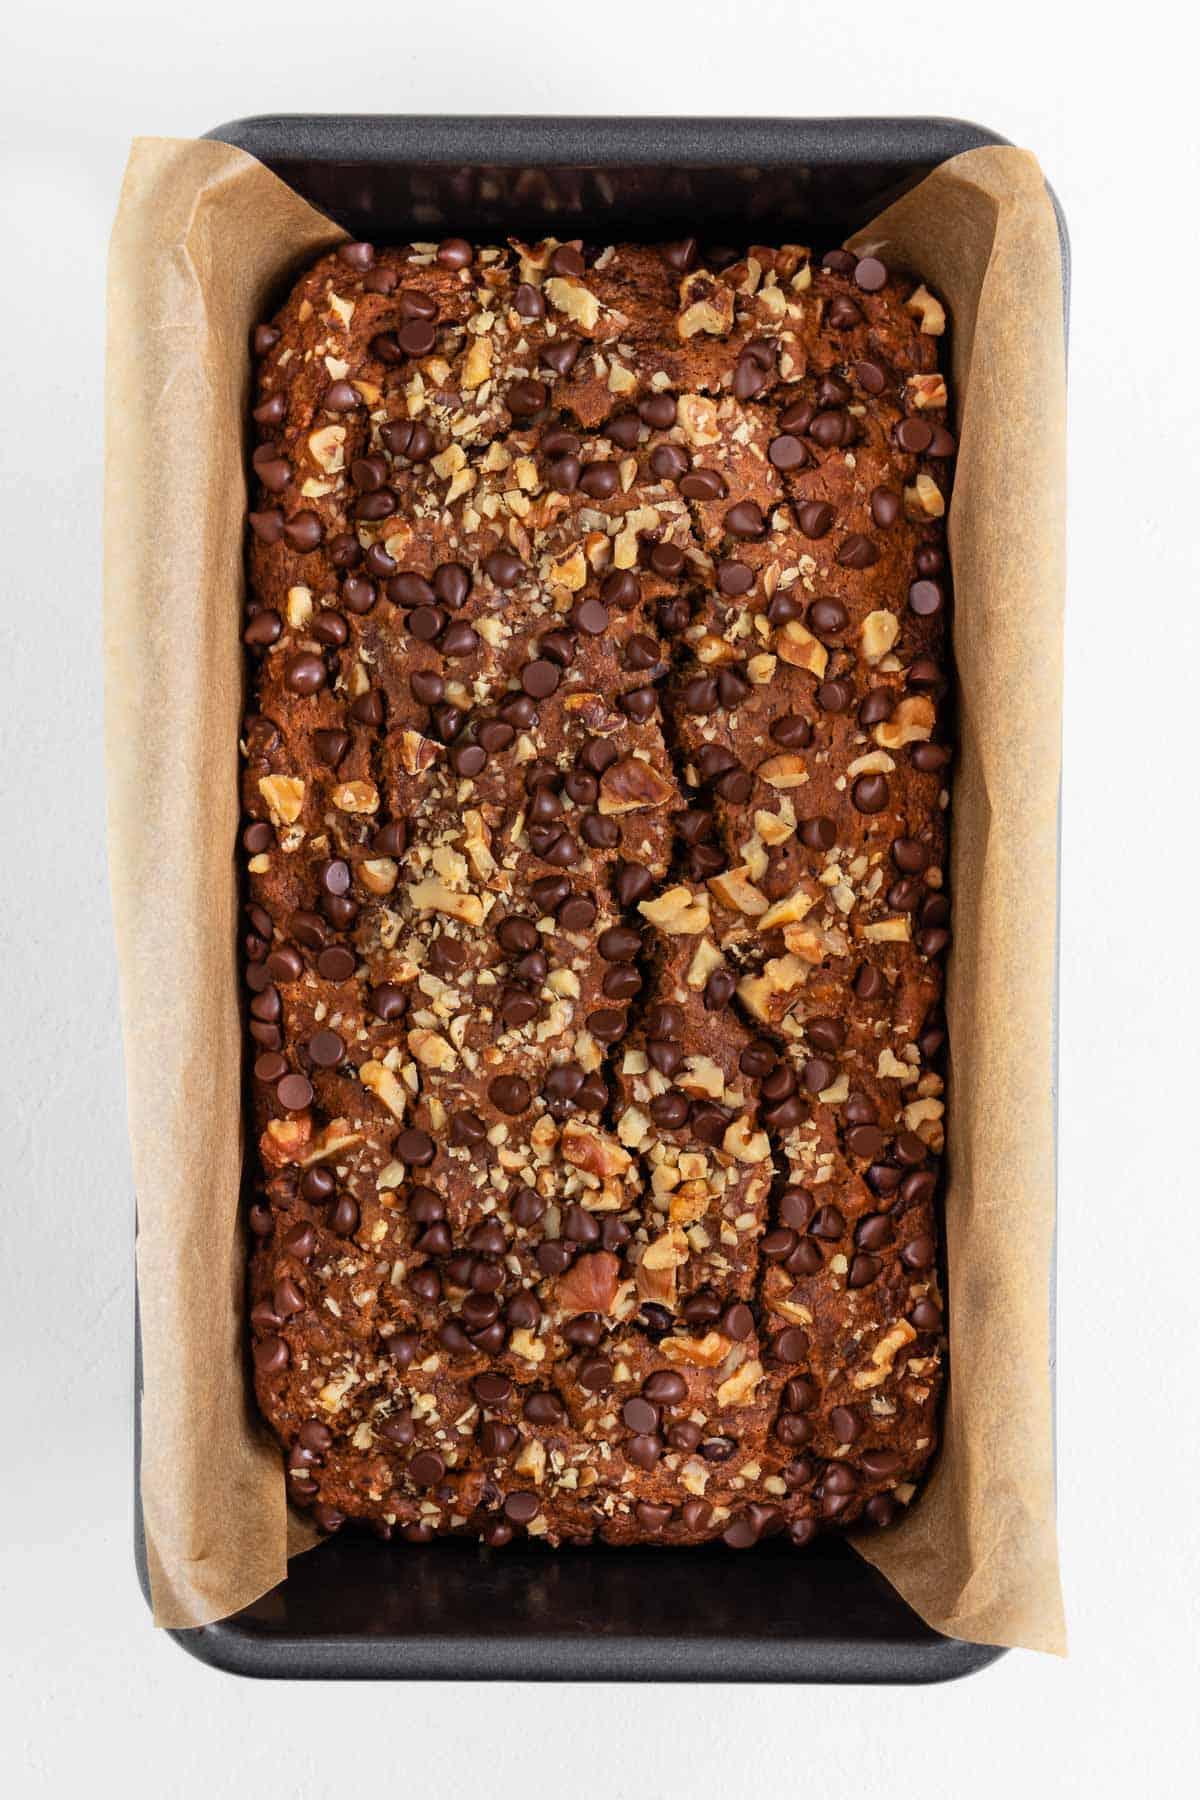 baked vegan gluten-free banana bread inside a loaf pan